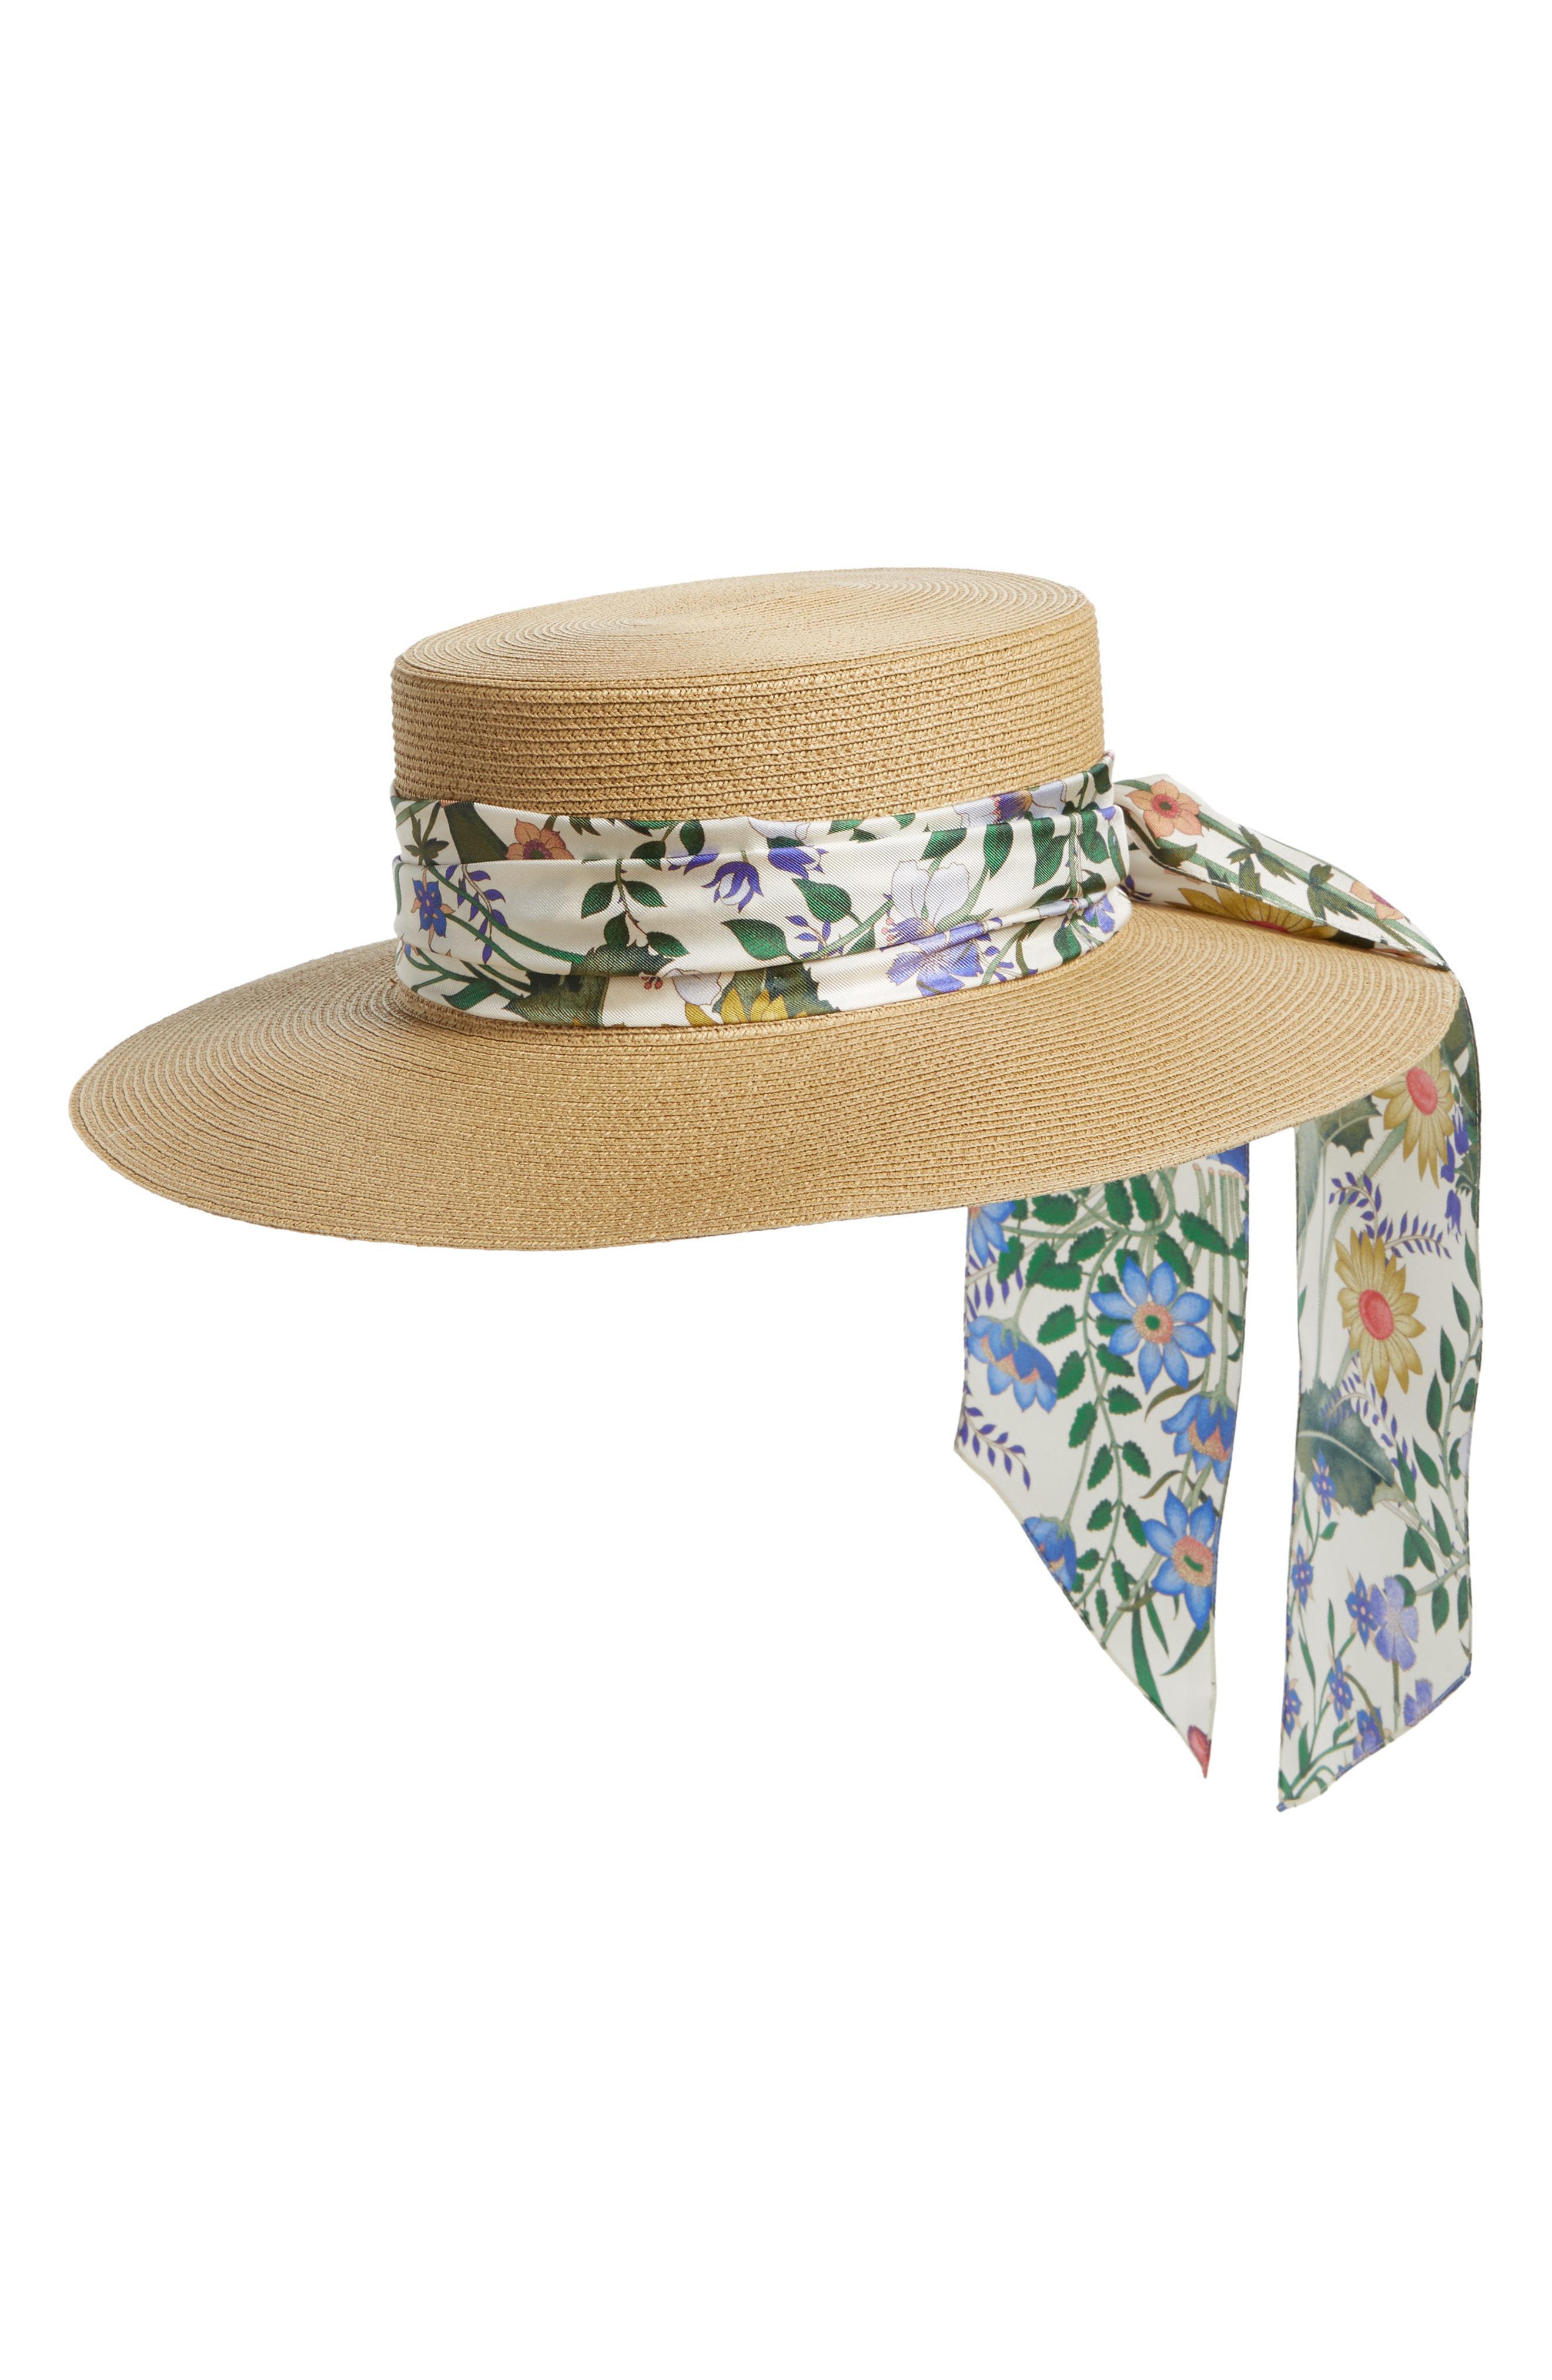 3606d684 Gucci. Women's Alba Straw Hat -